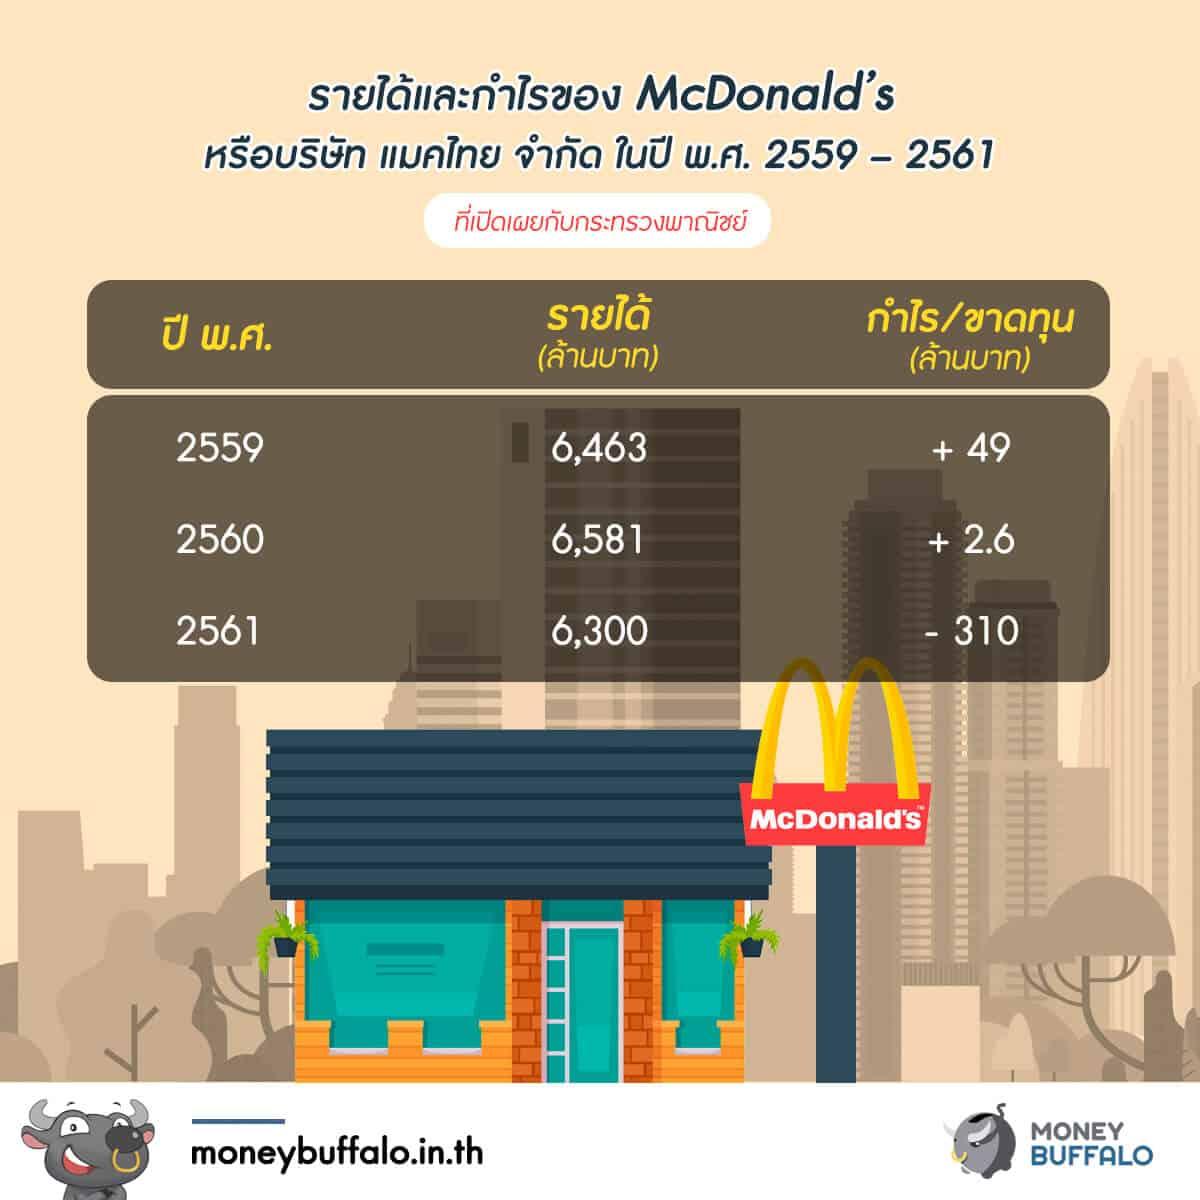 Mcdonald's วิกฤตขาดทุน ทยอยปิดสาขา